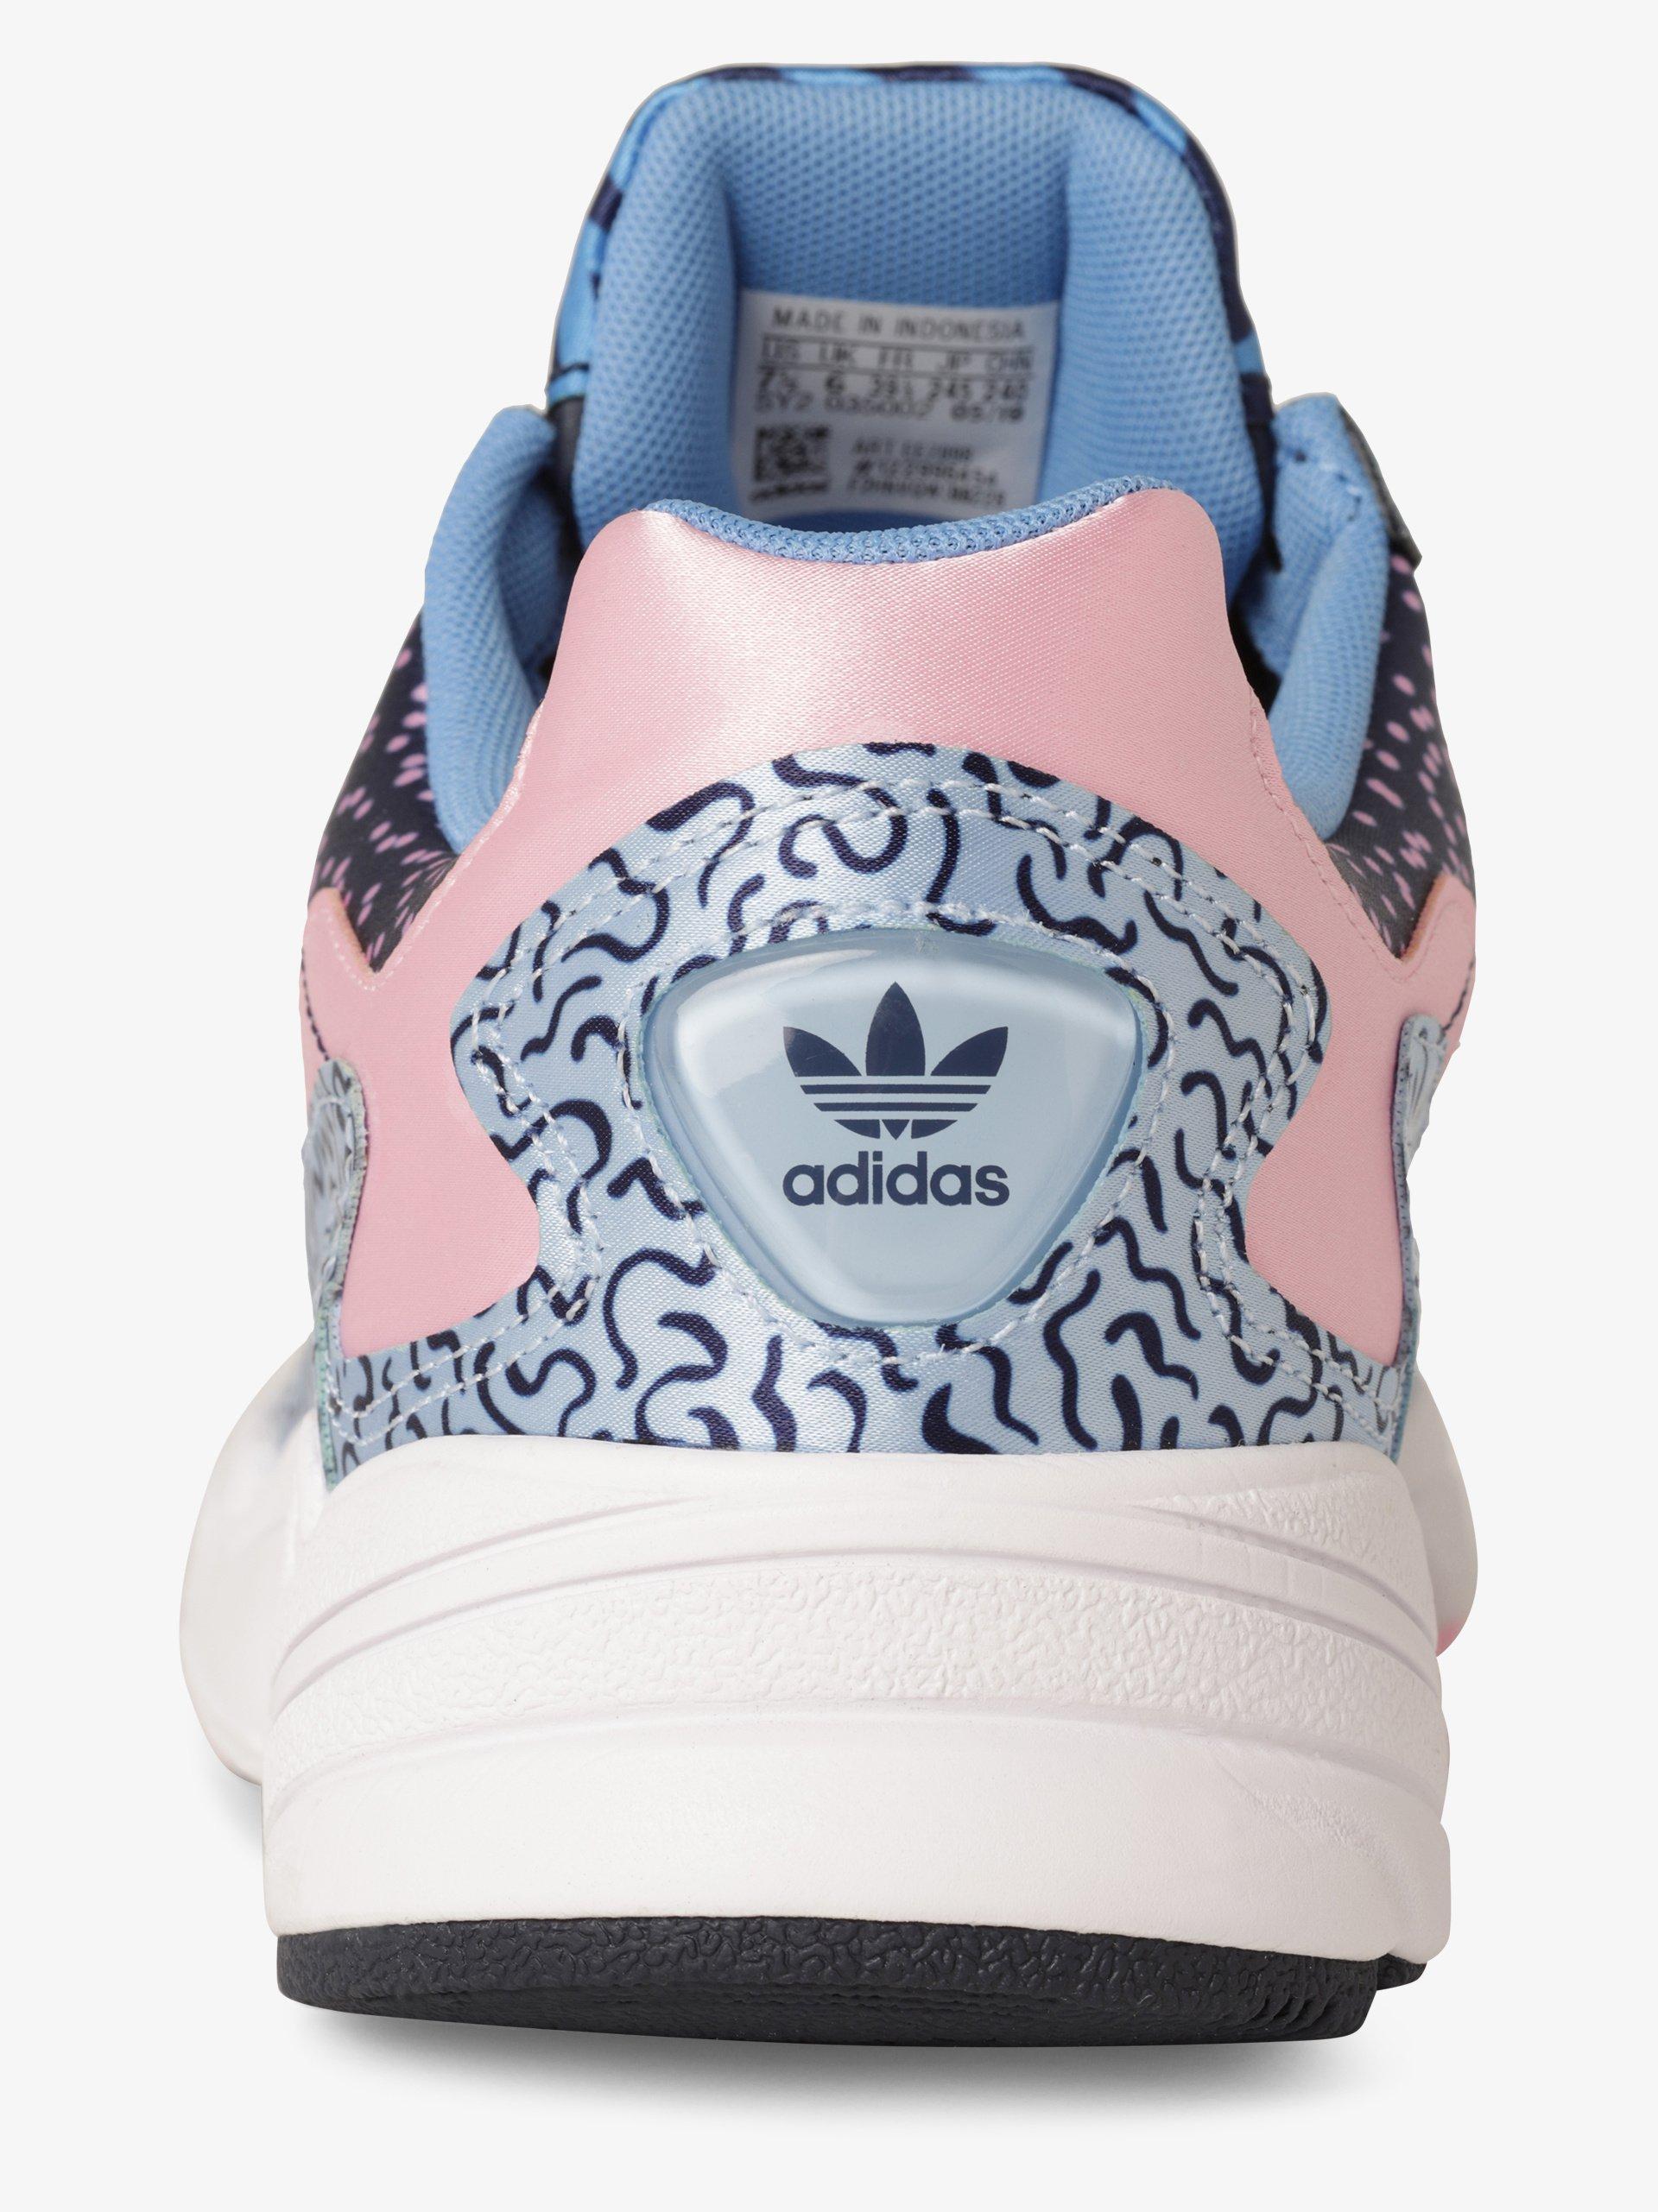 adidas Originals Tenisówki damskie – Falcon W